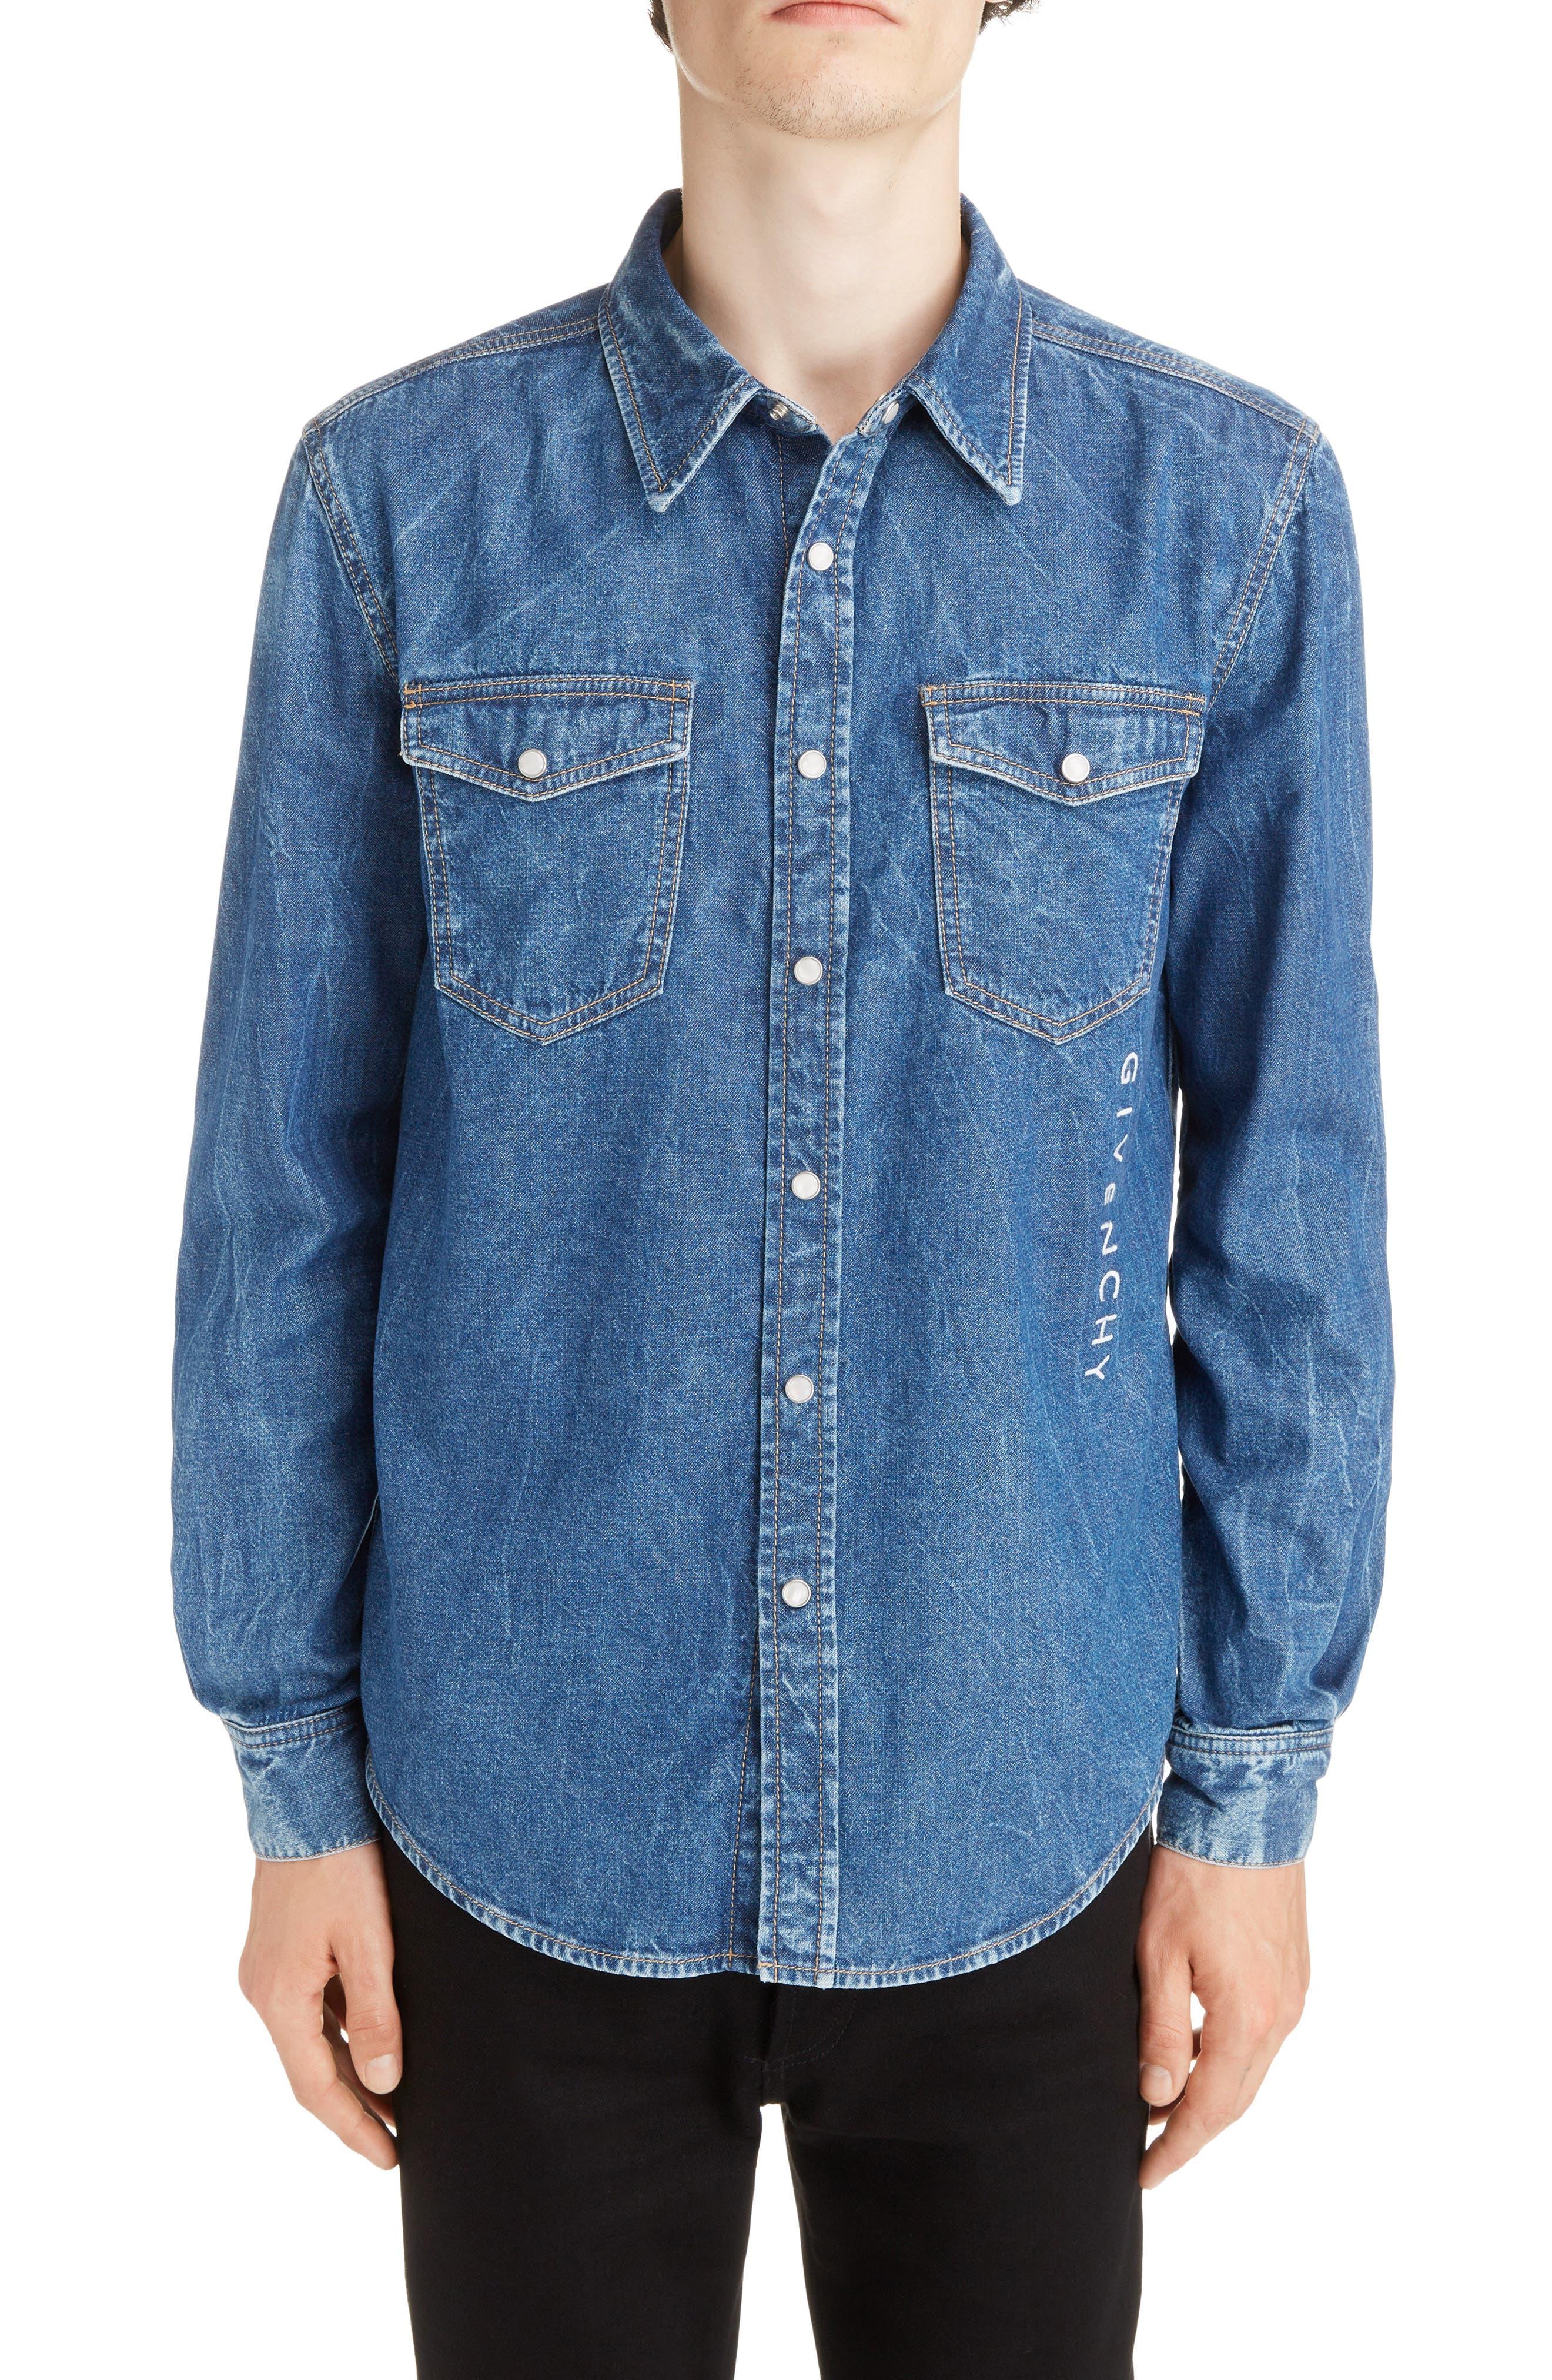 GIVENCHY Denim Shirt, Main, color, MEDIUM BLUE